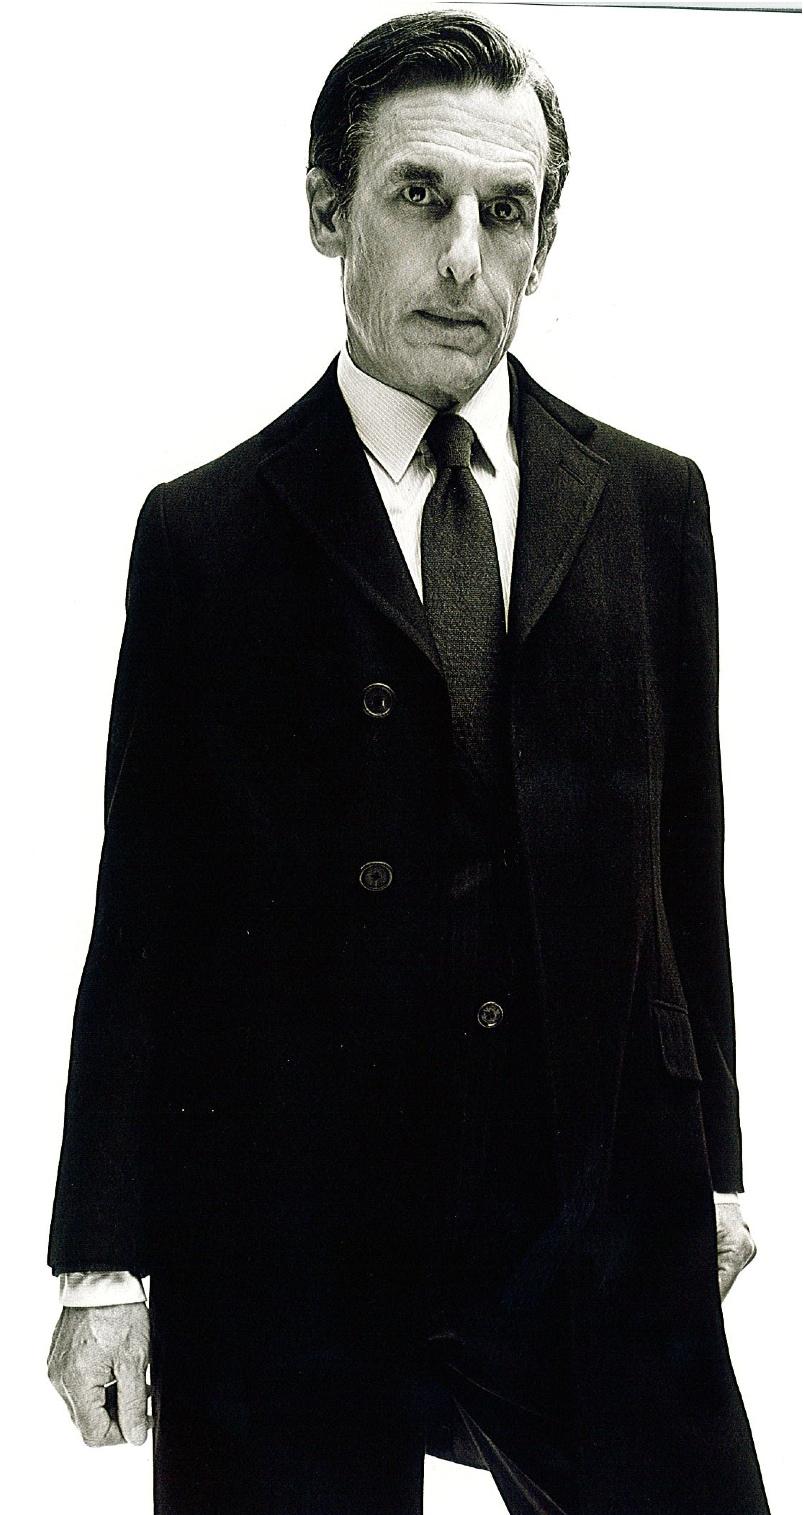 Rester discret avec… un manteau sobre.